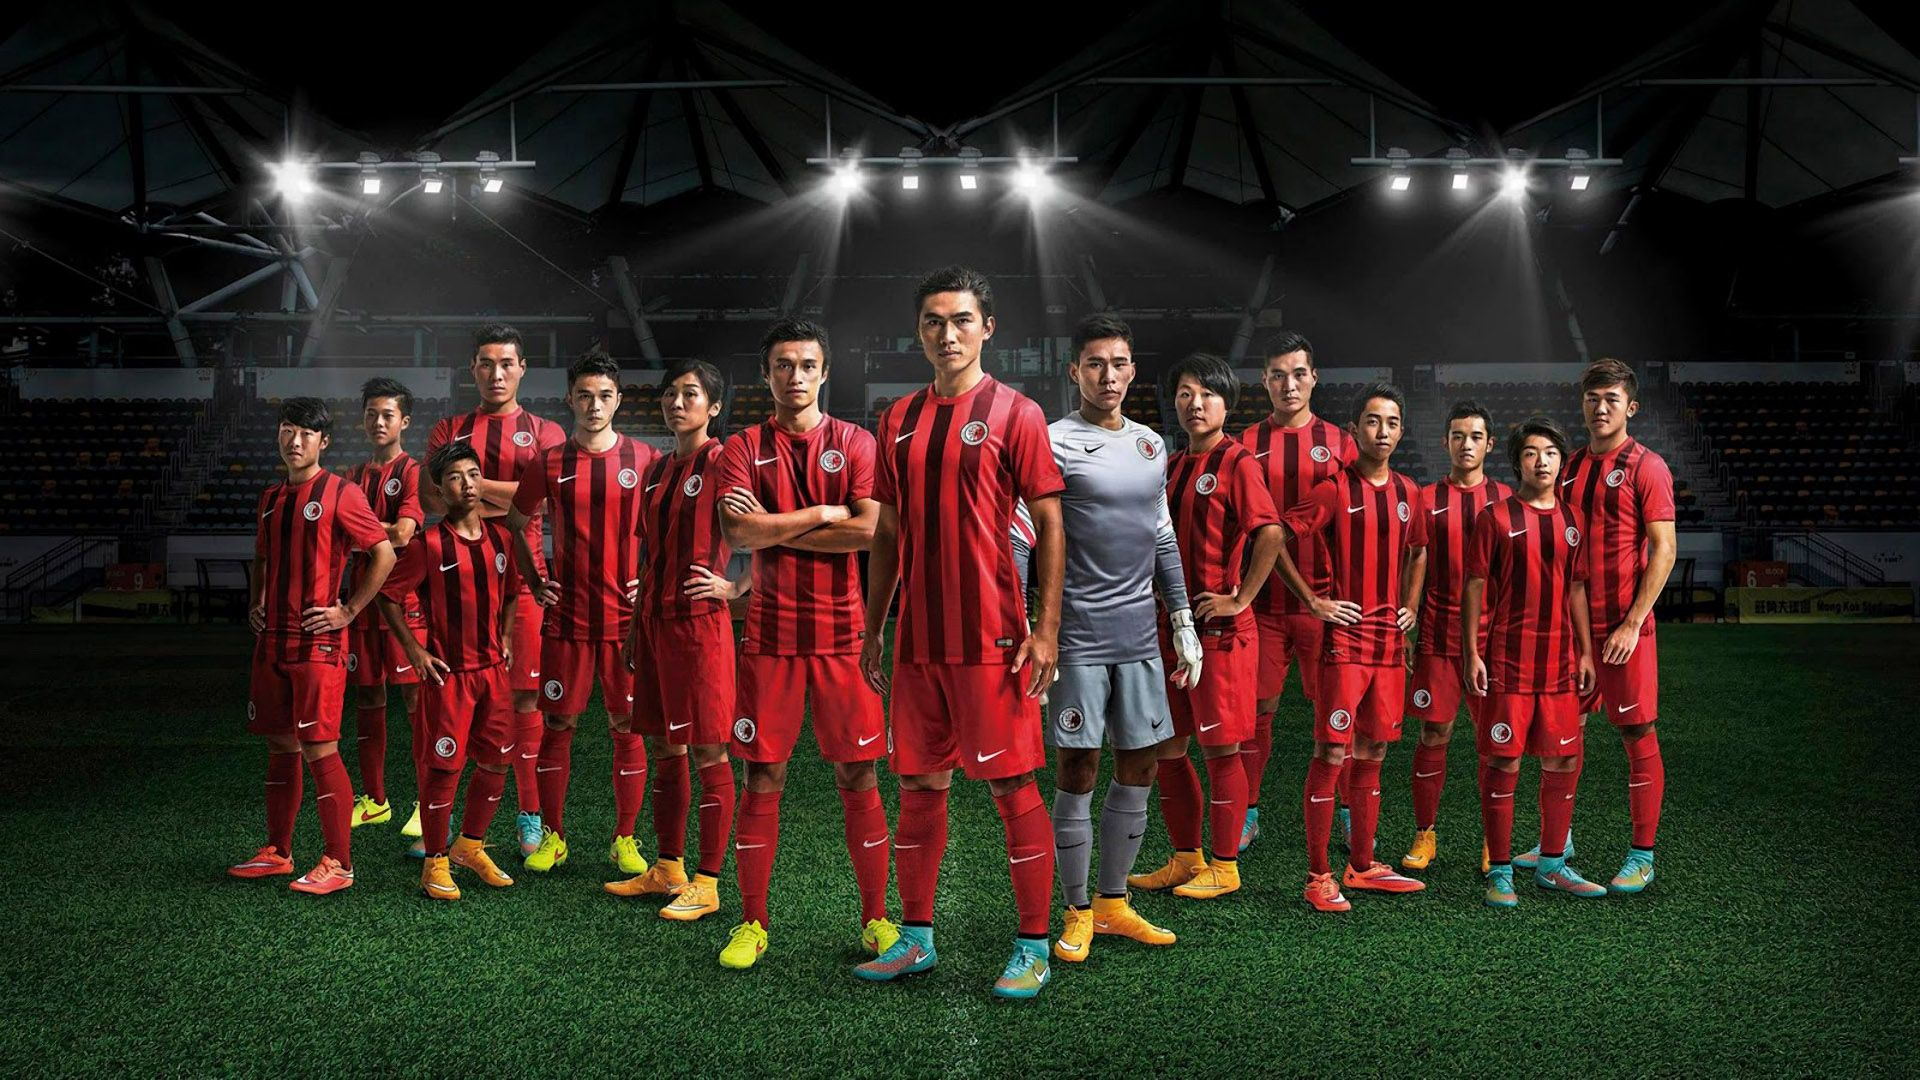 Futbol Soccer Nike Wallpapers 2015 1920x1080